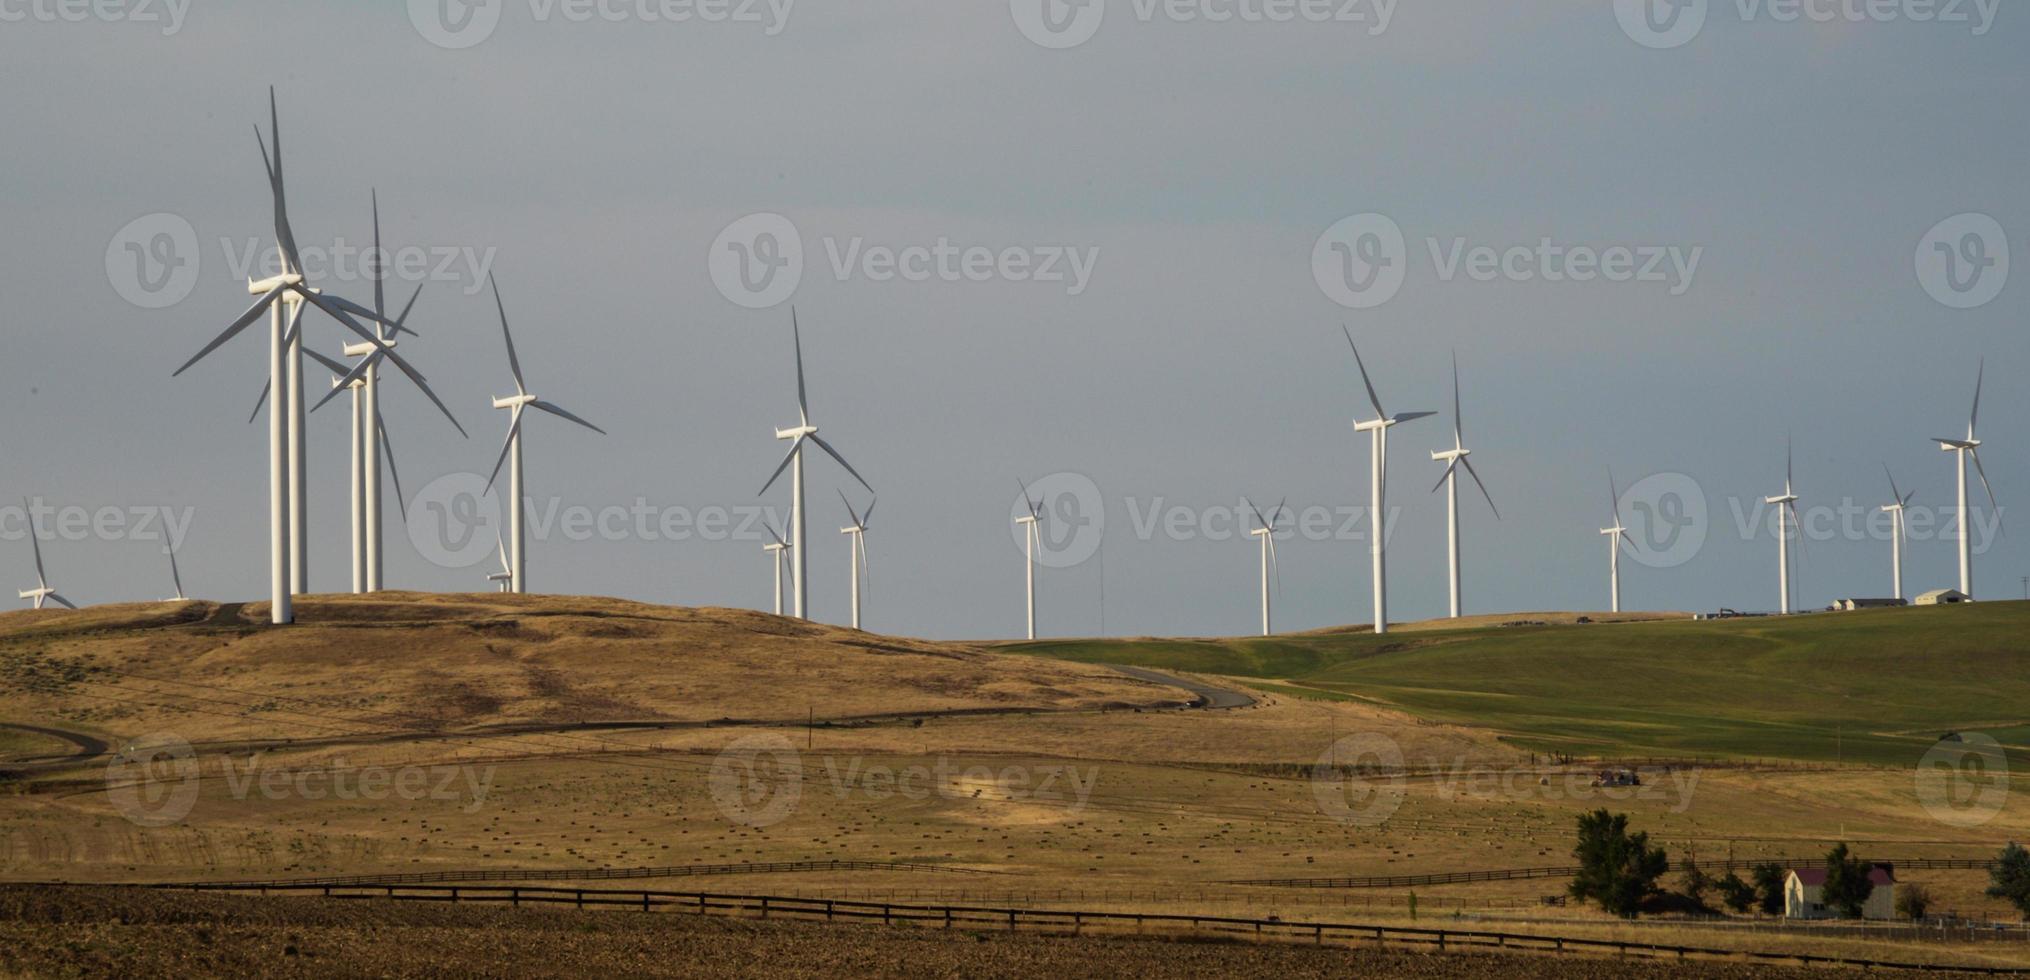 turbines in windpark foto